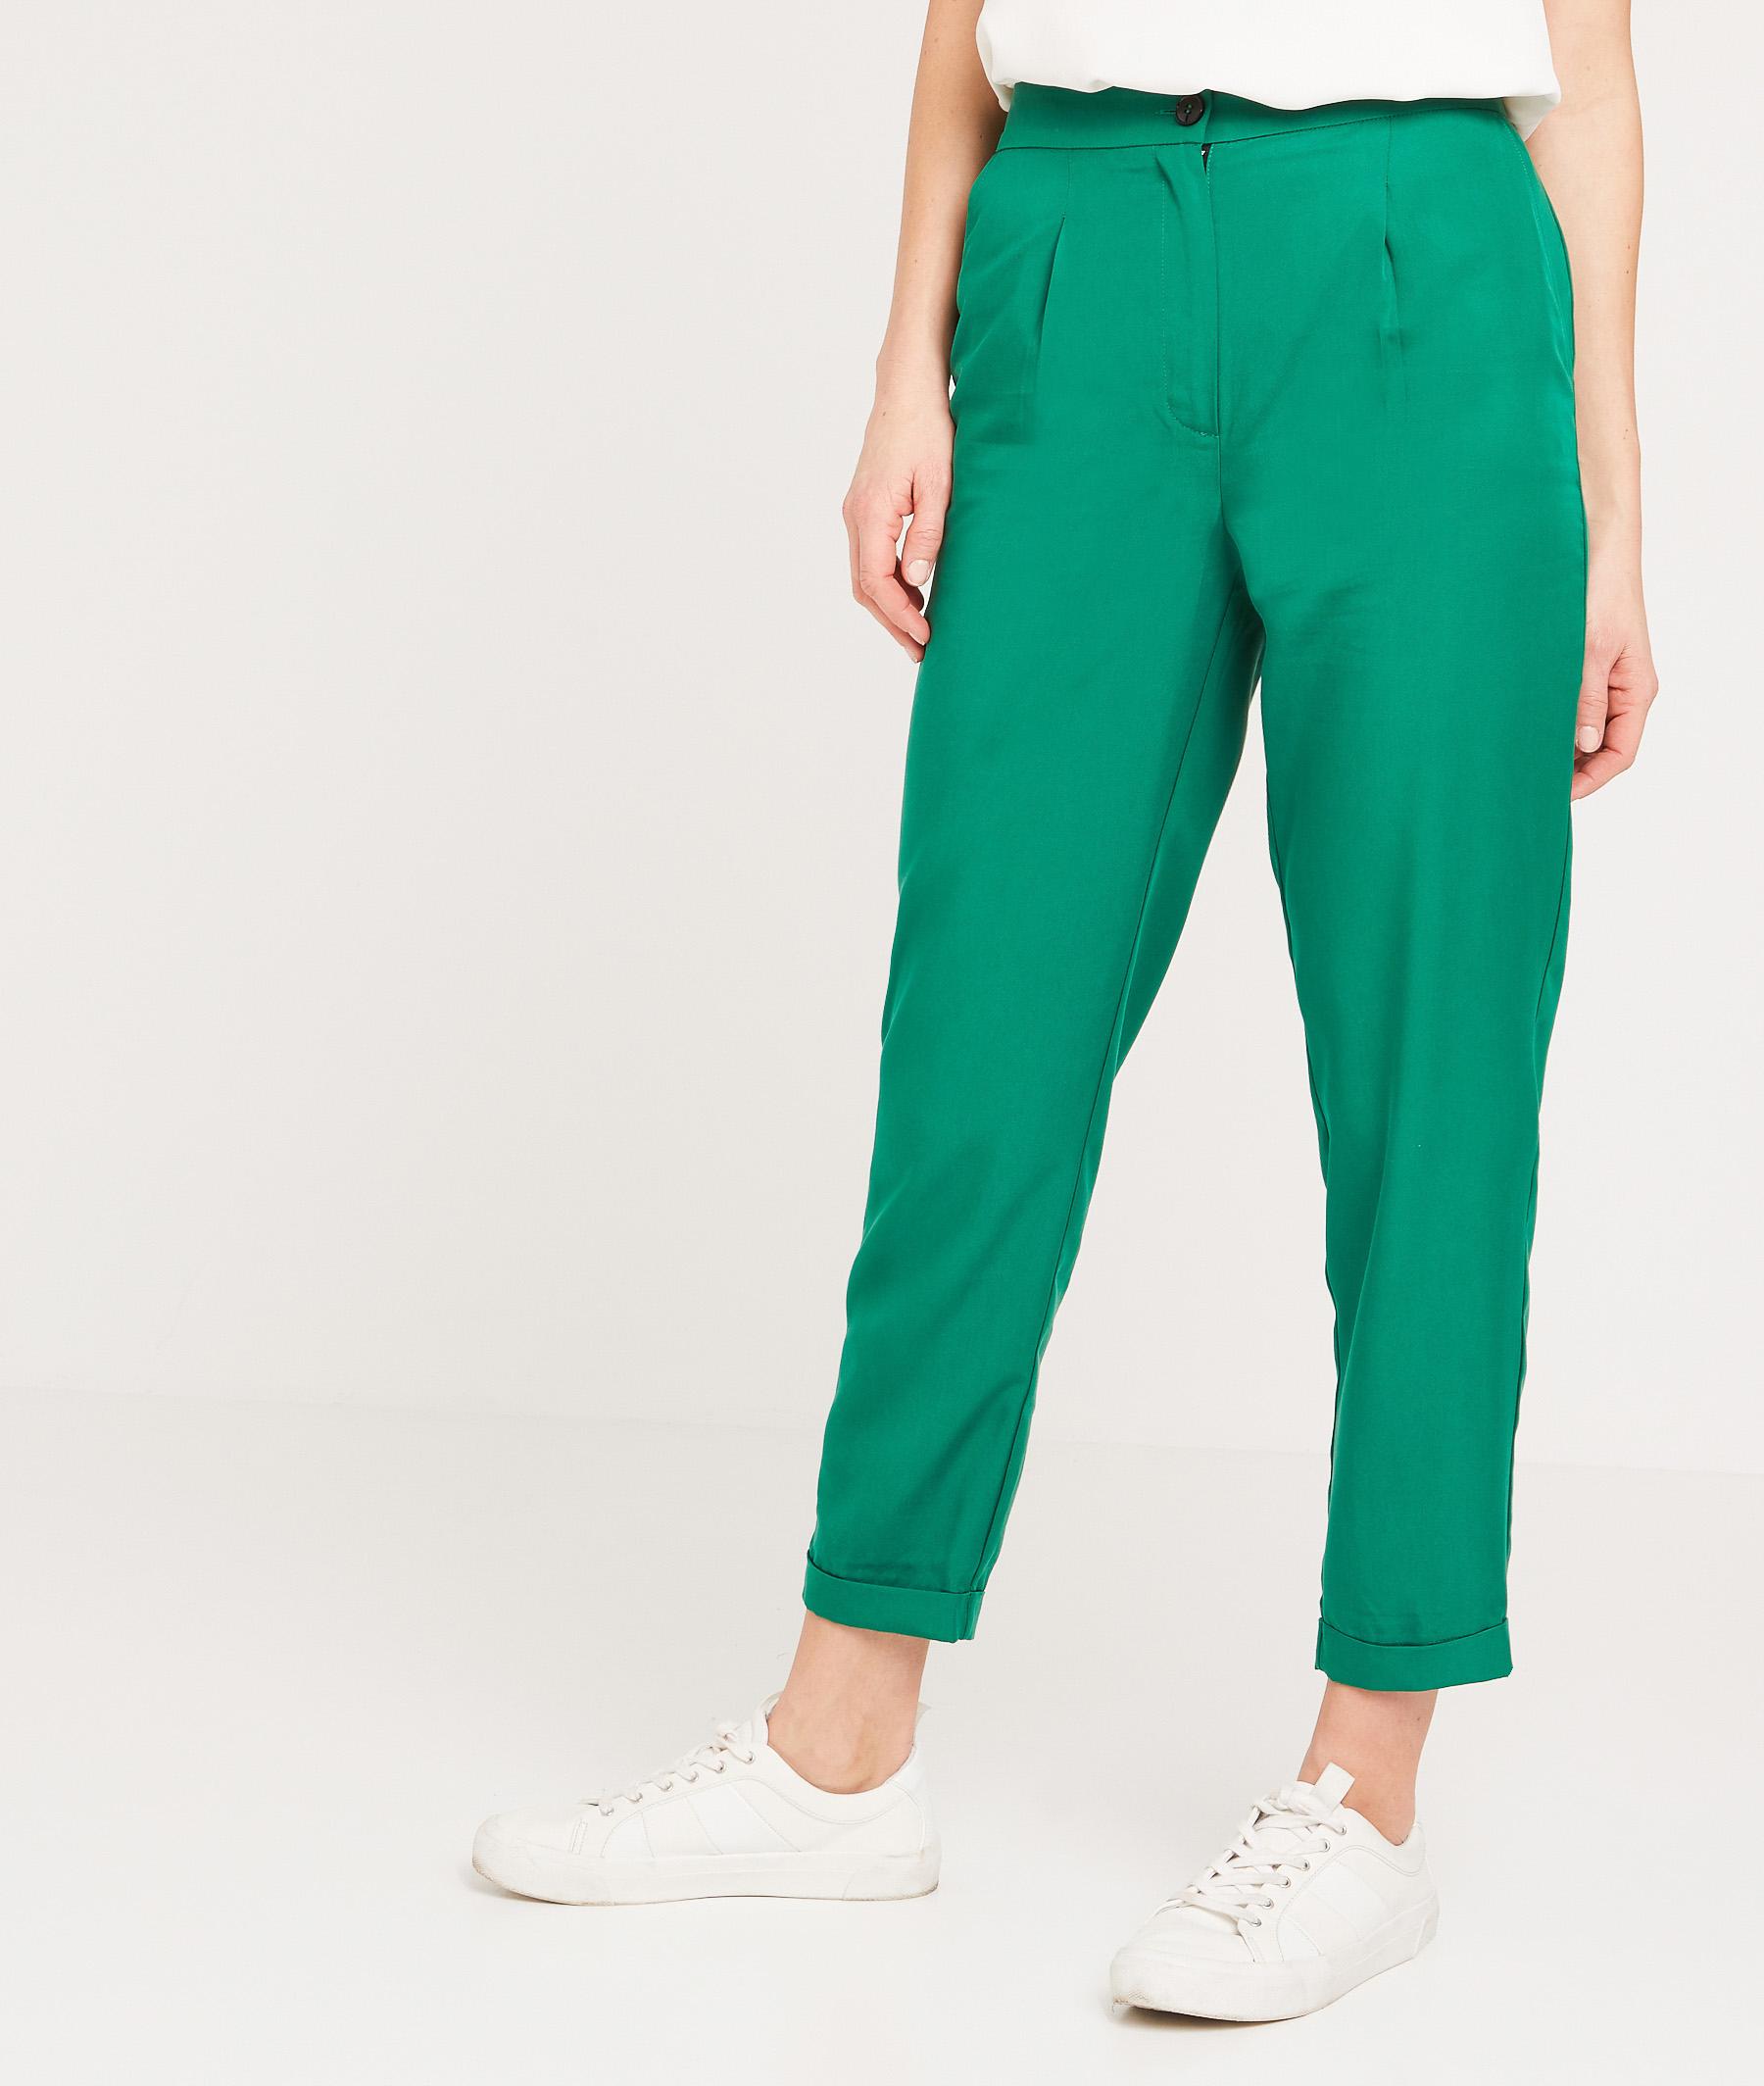 pantalon femme vert